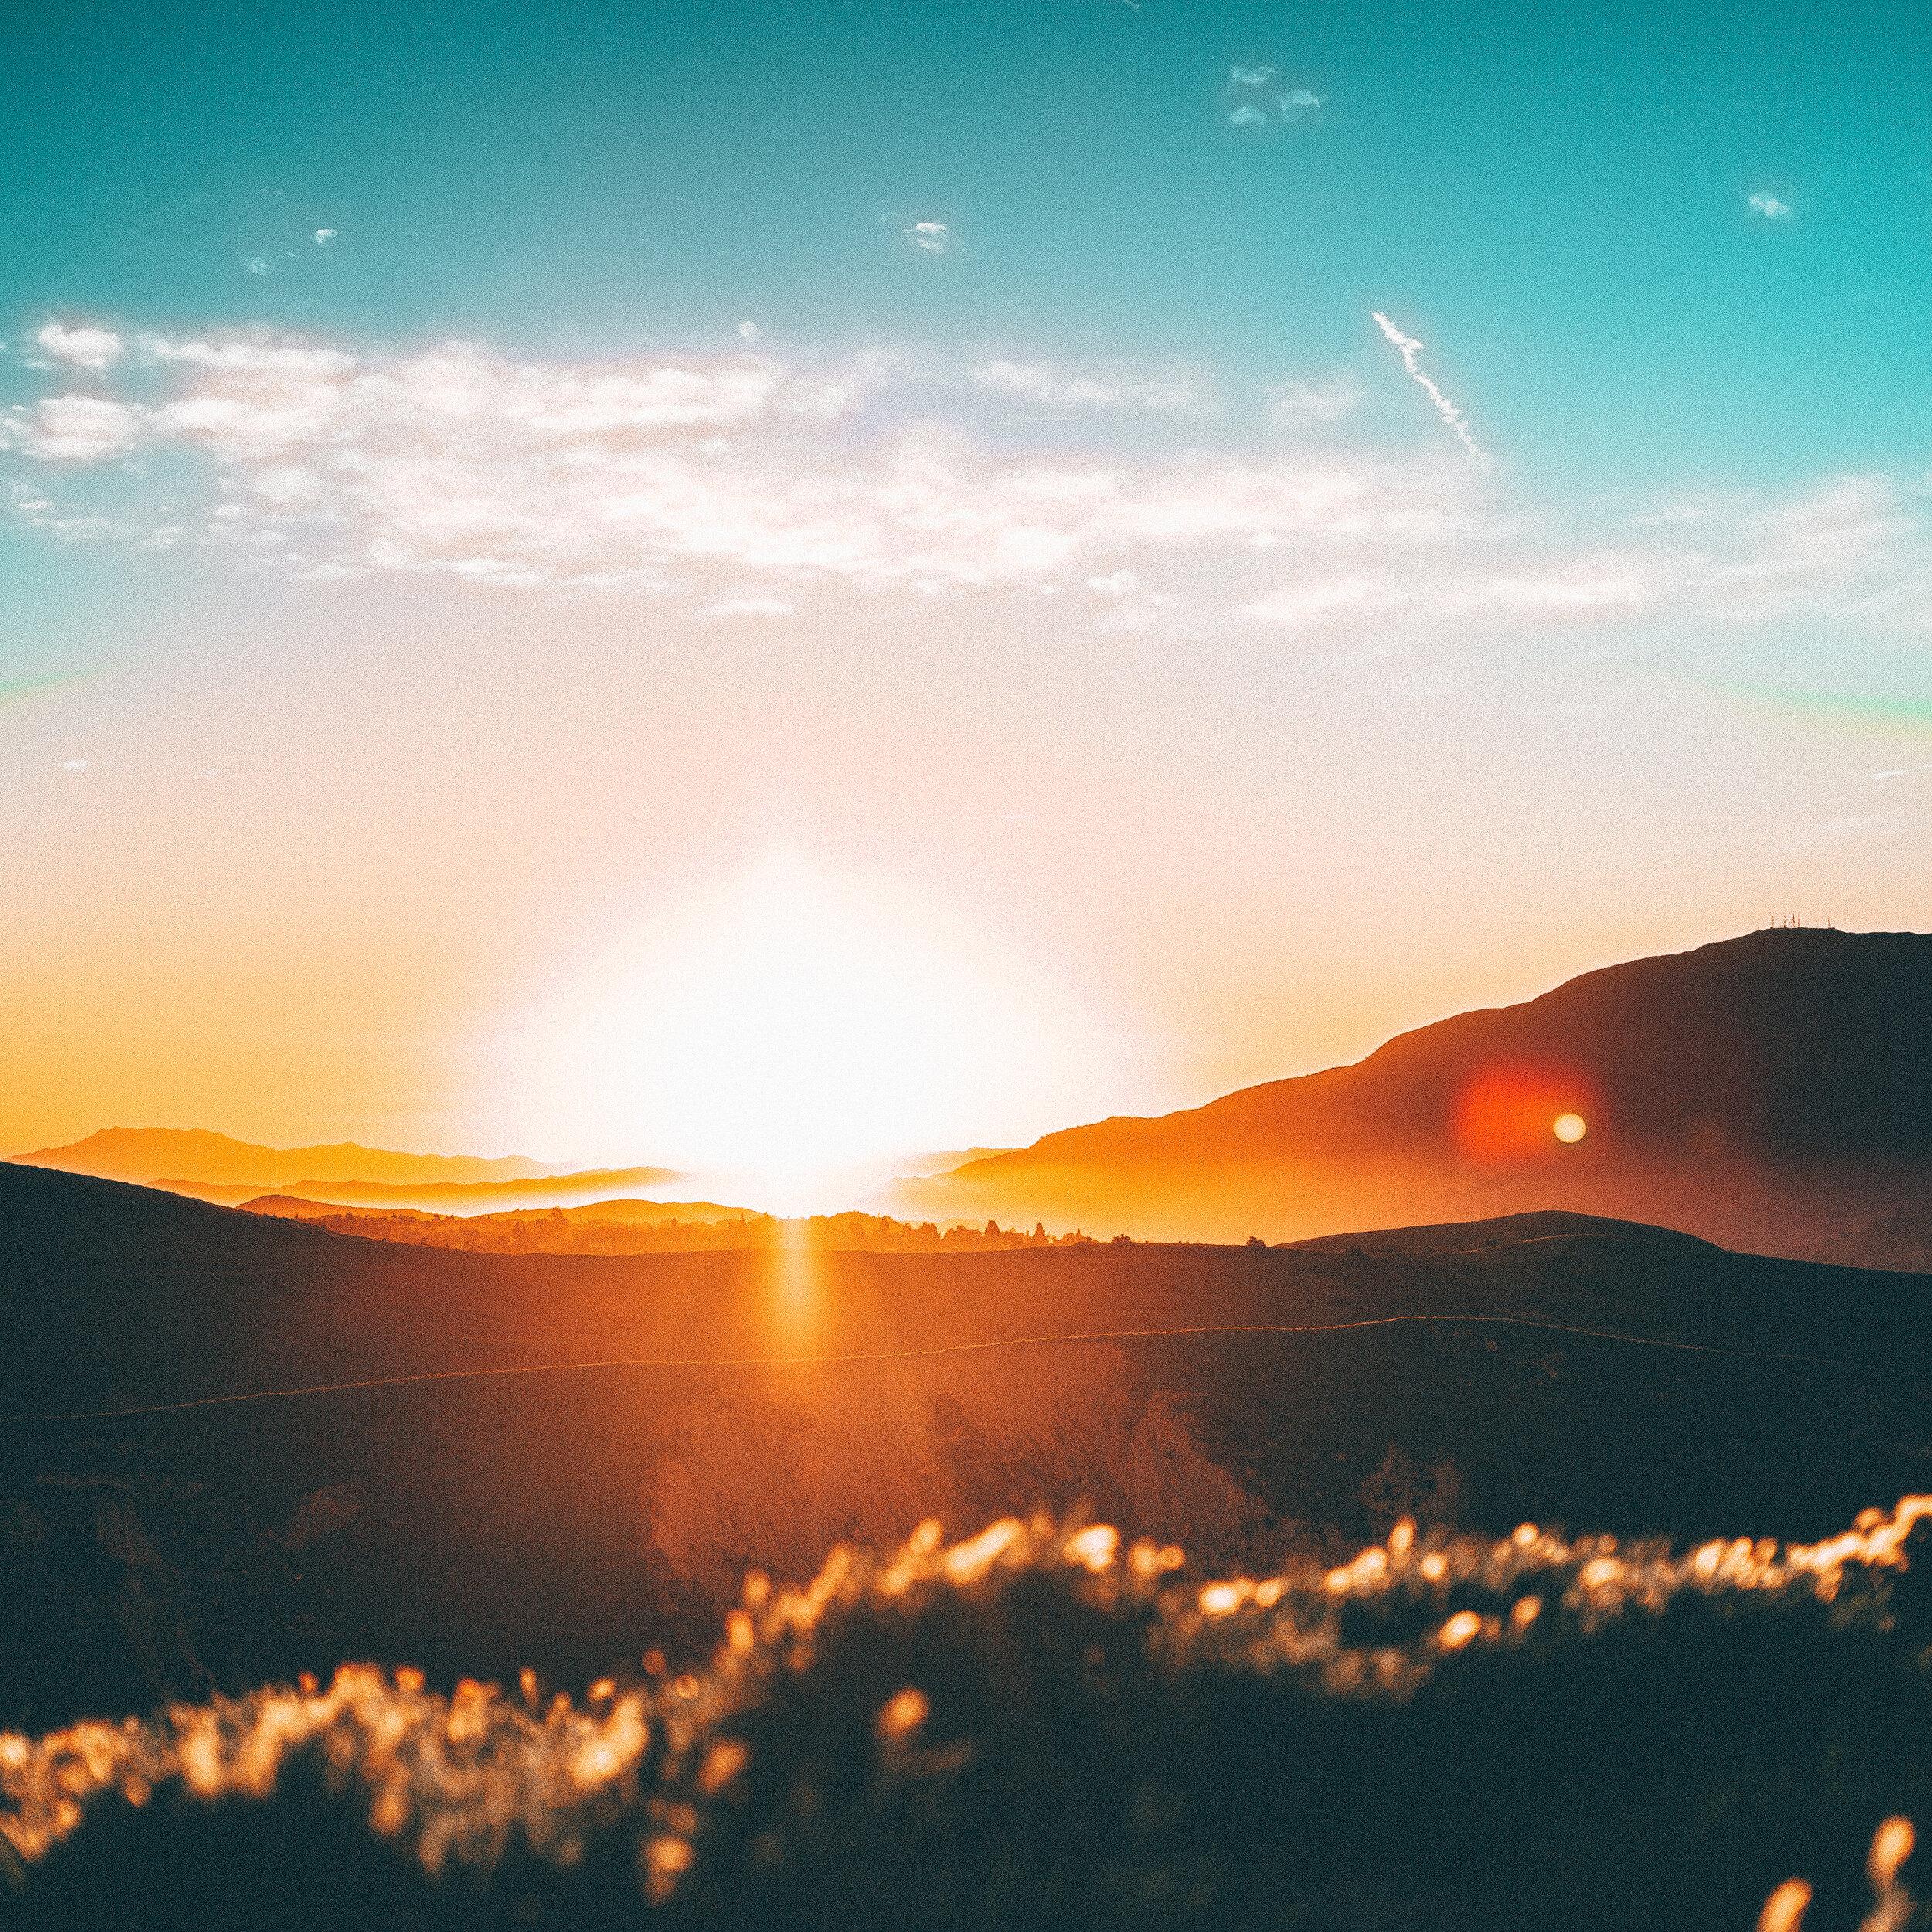 sun peaking over the horizon